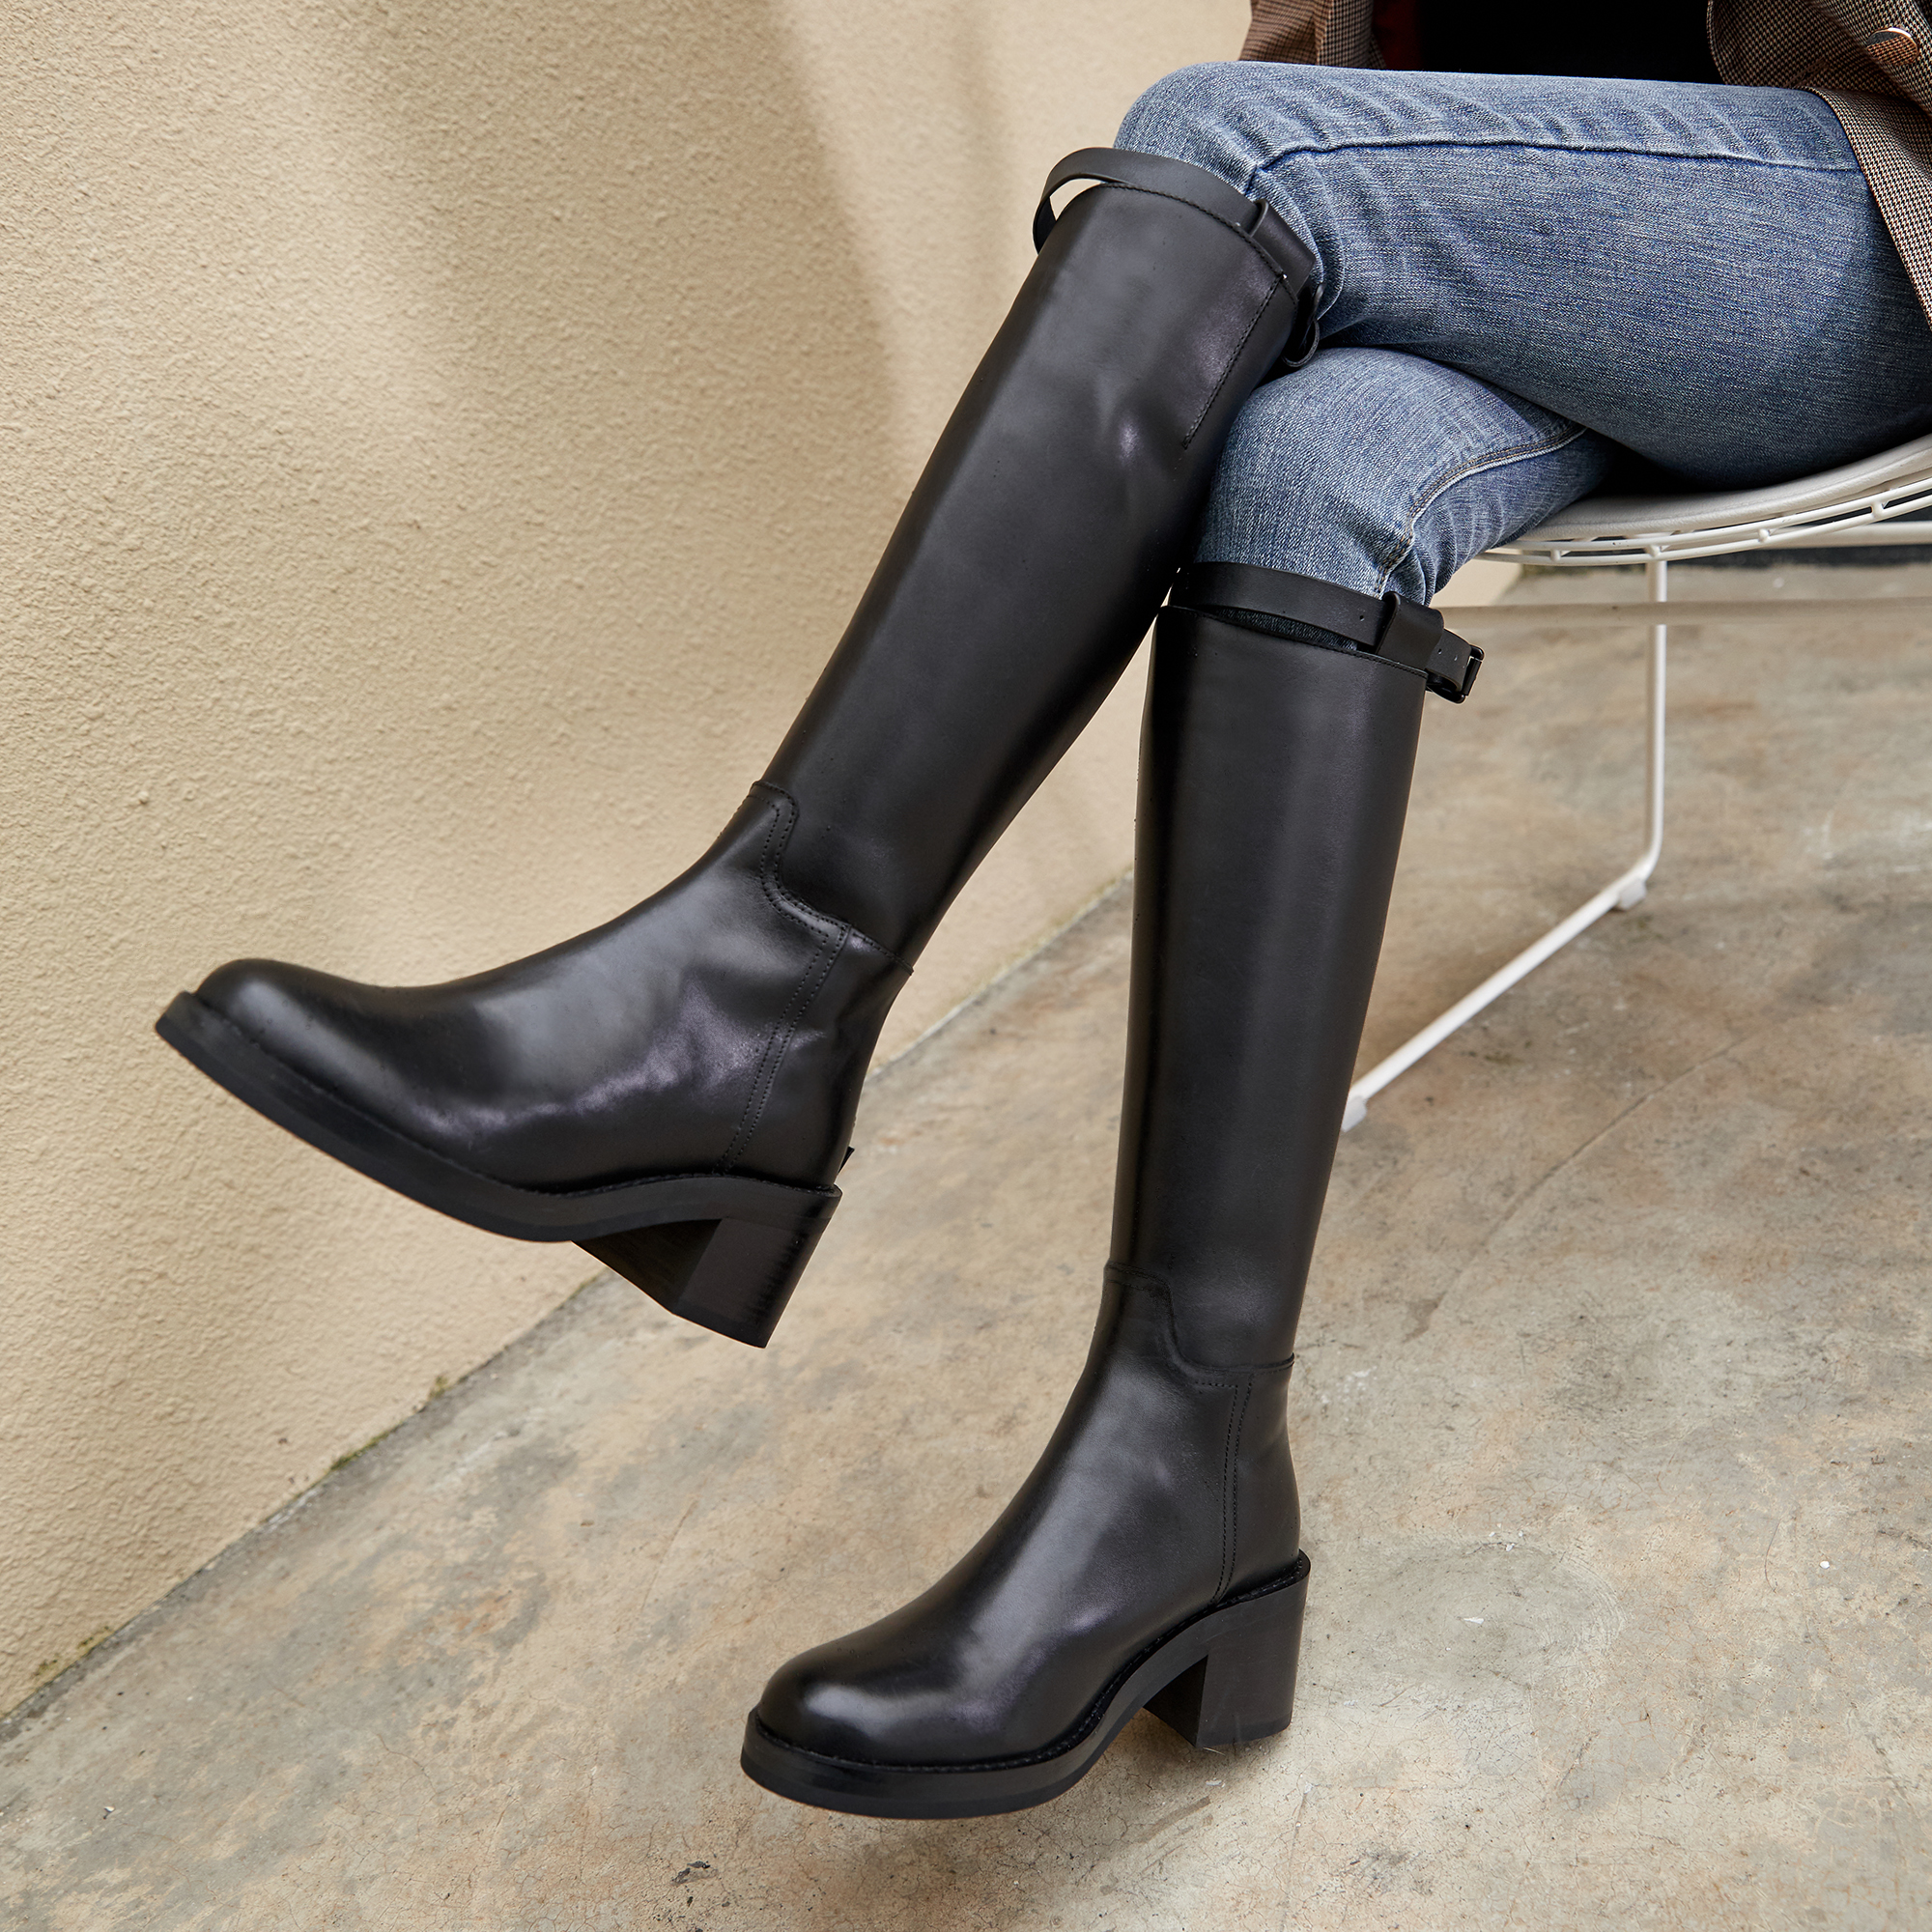 Fashion women's shoes winter 2019 round